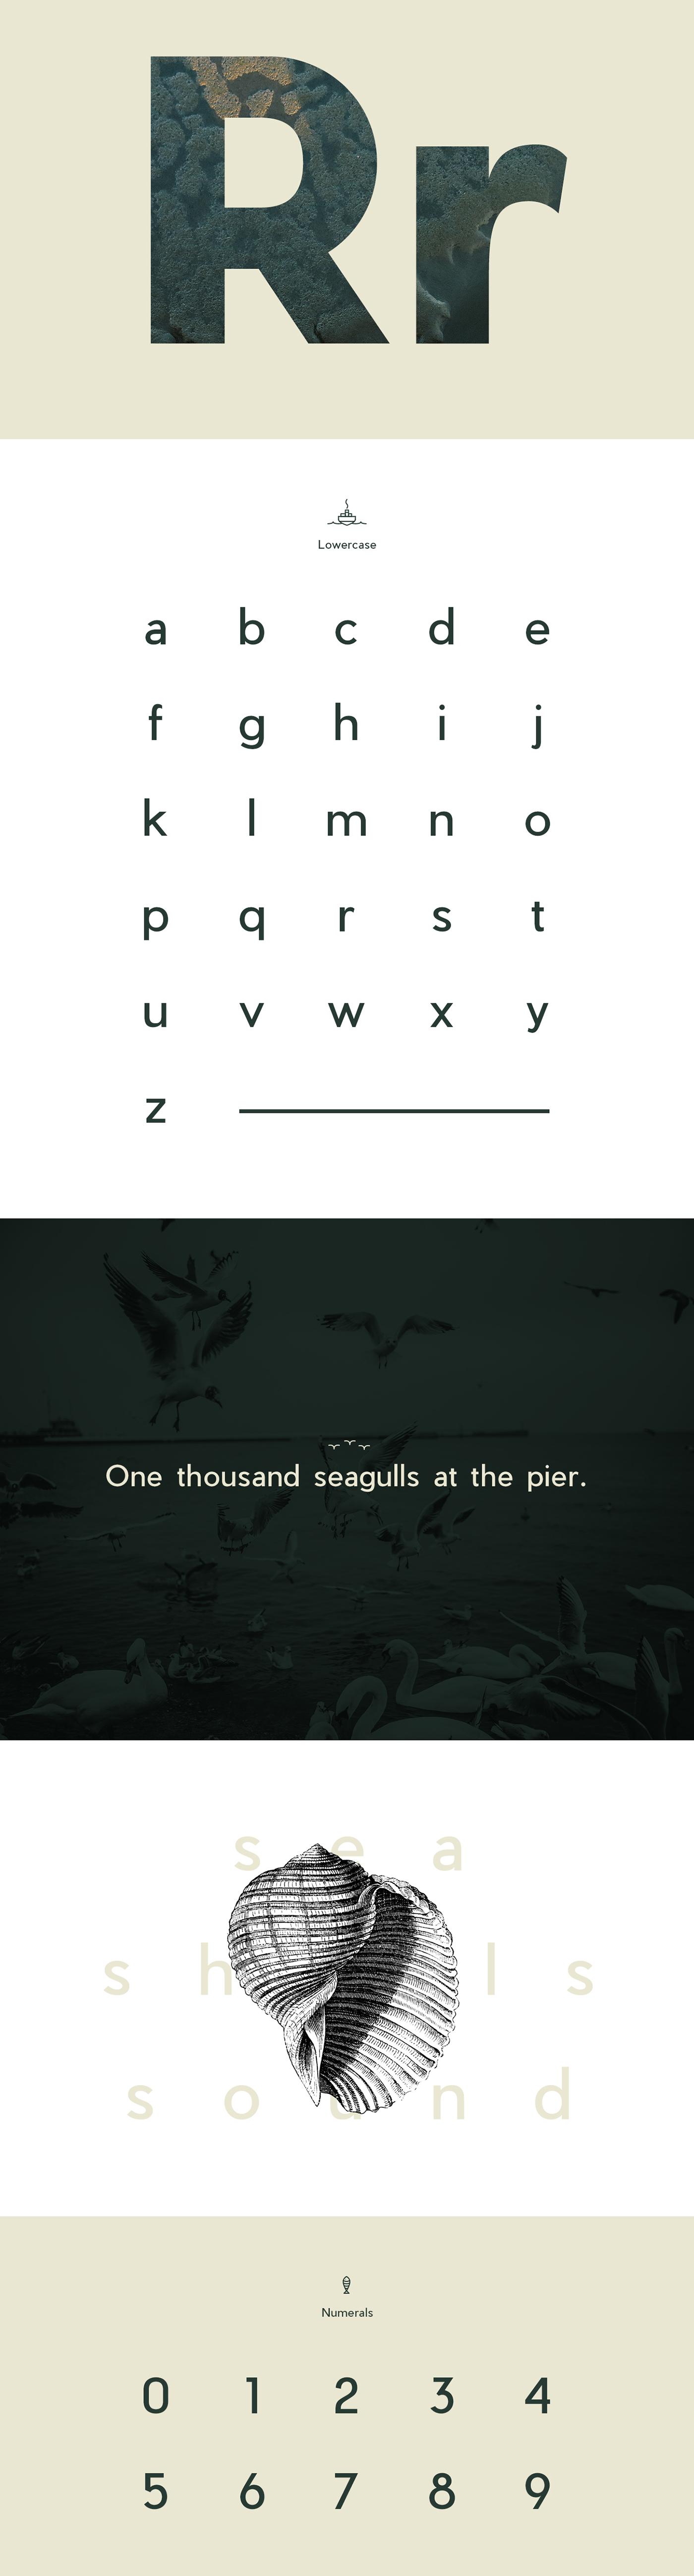 font free type Typeface water pier dock anchor modern